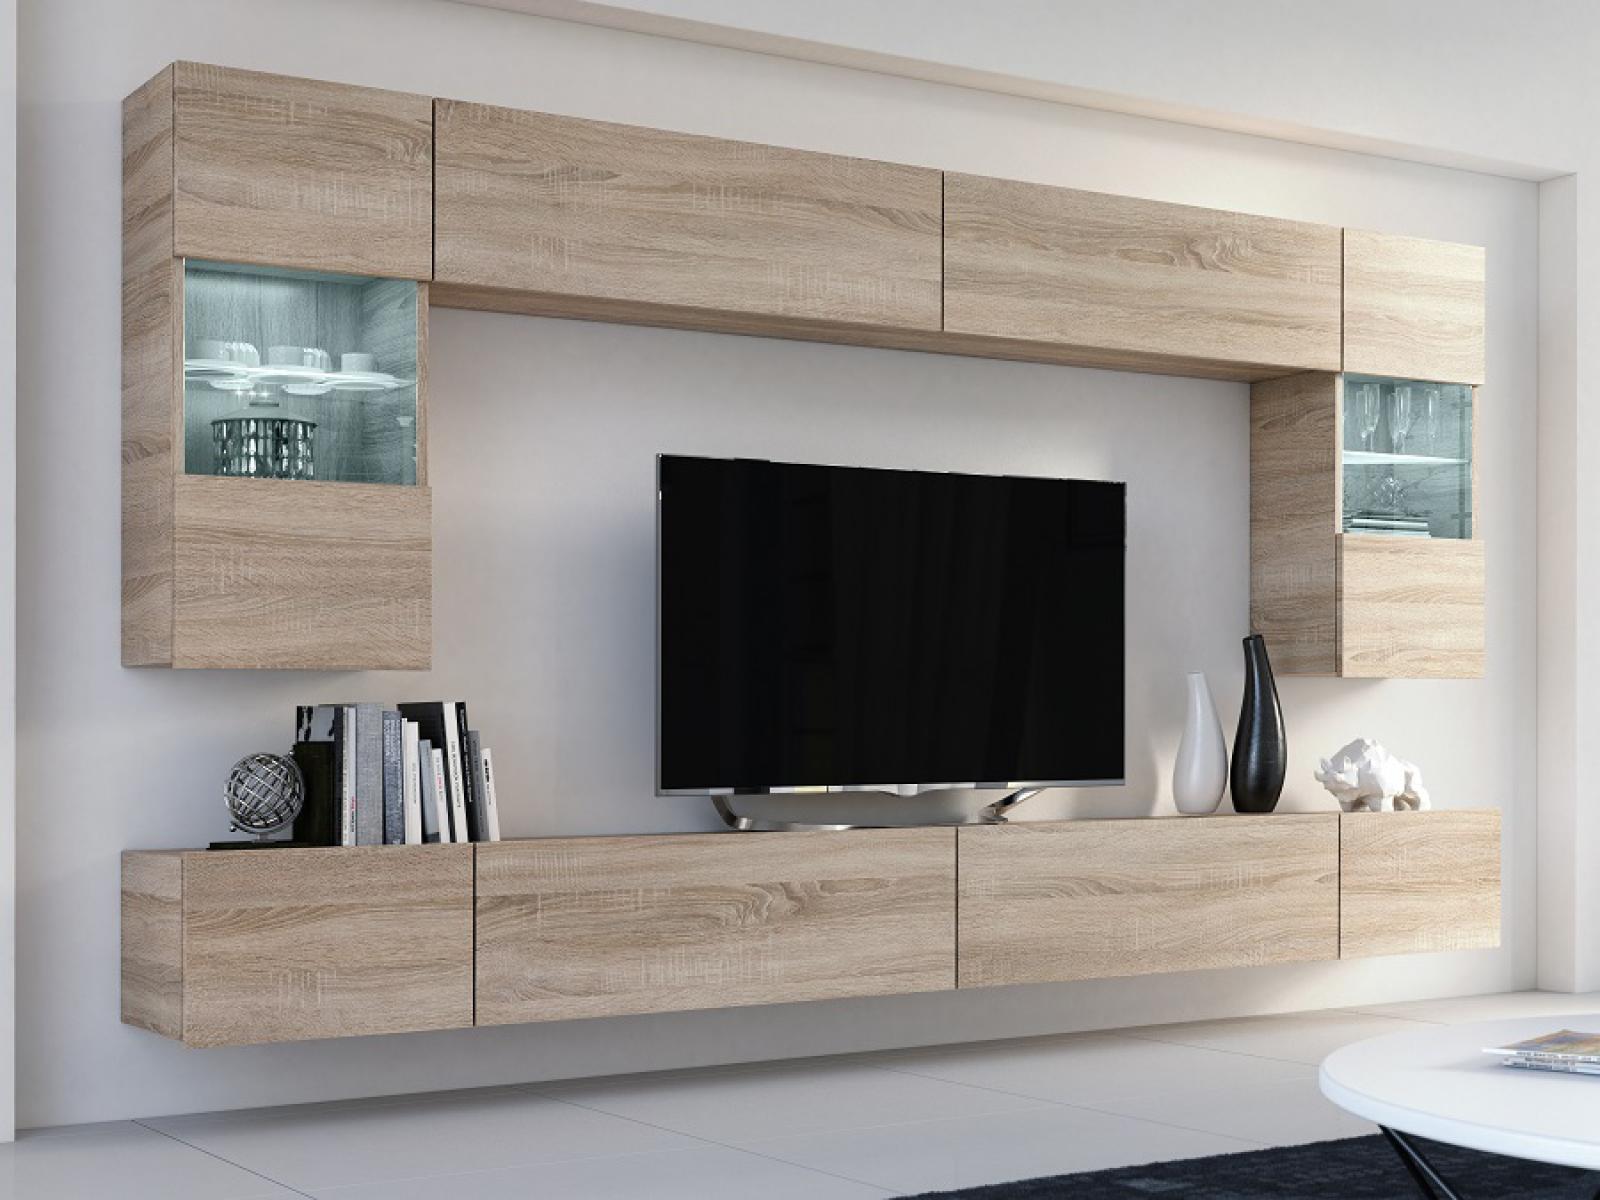 Wohnwand Flow Sonoma Eiche Mediawand Medienwand Design Modern Led  Beleuchtung Hängewand Hängeschrank TV Wand